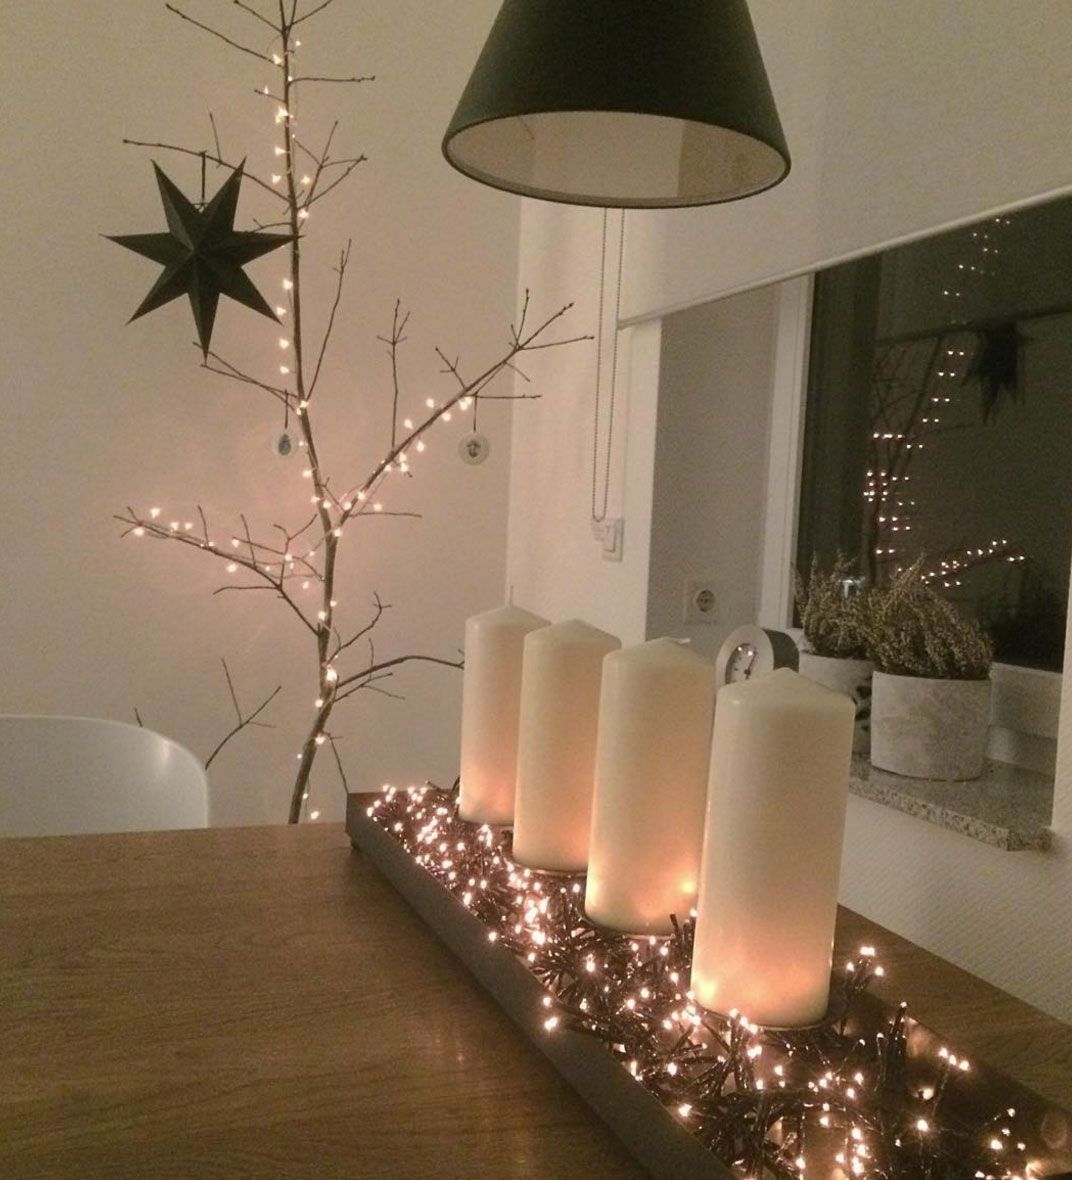 Deco Candles Advent Lichterkette With Informations About Deko